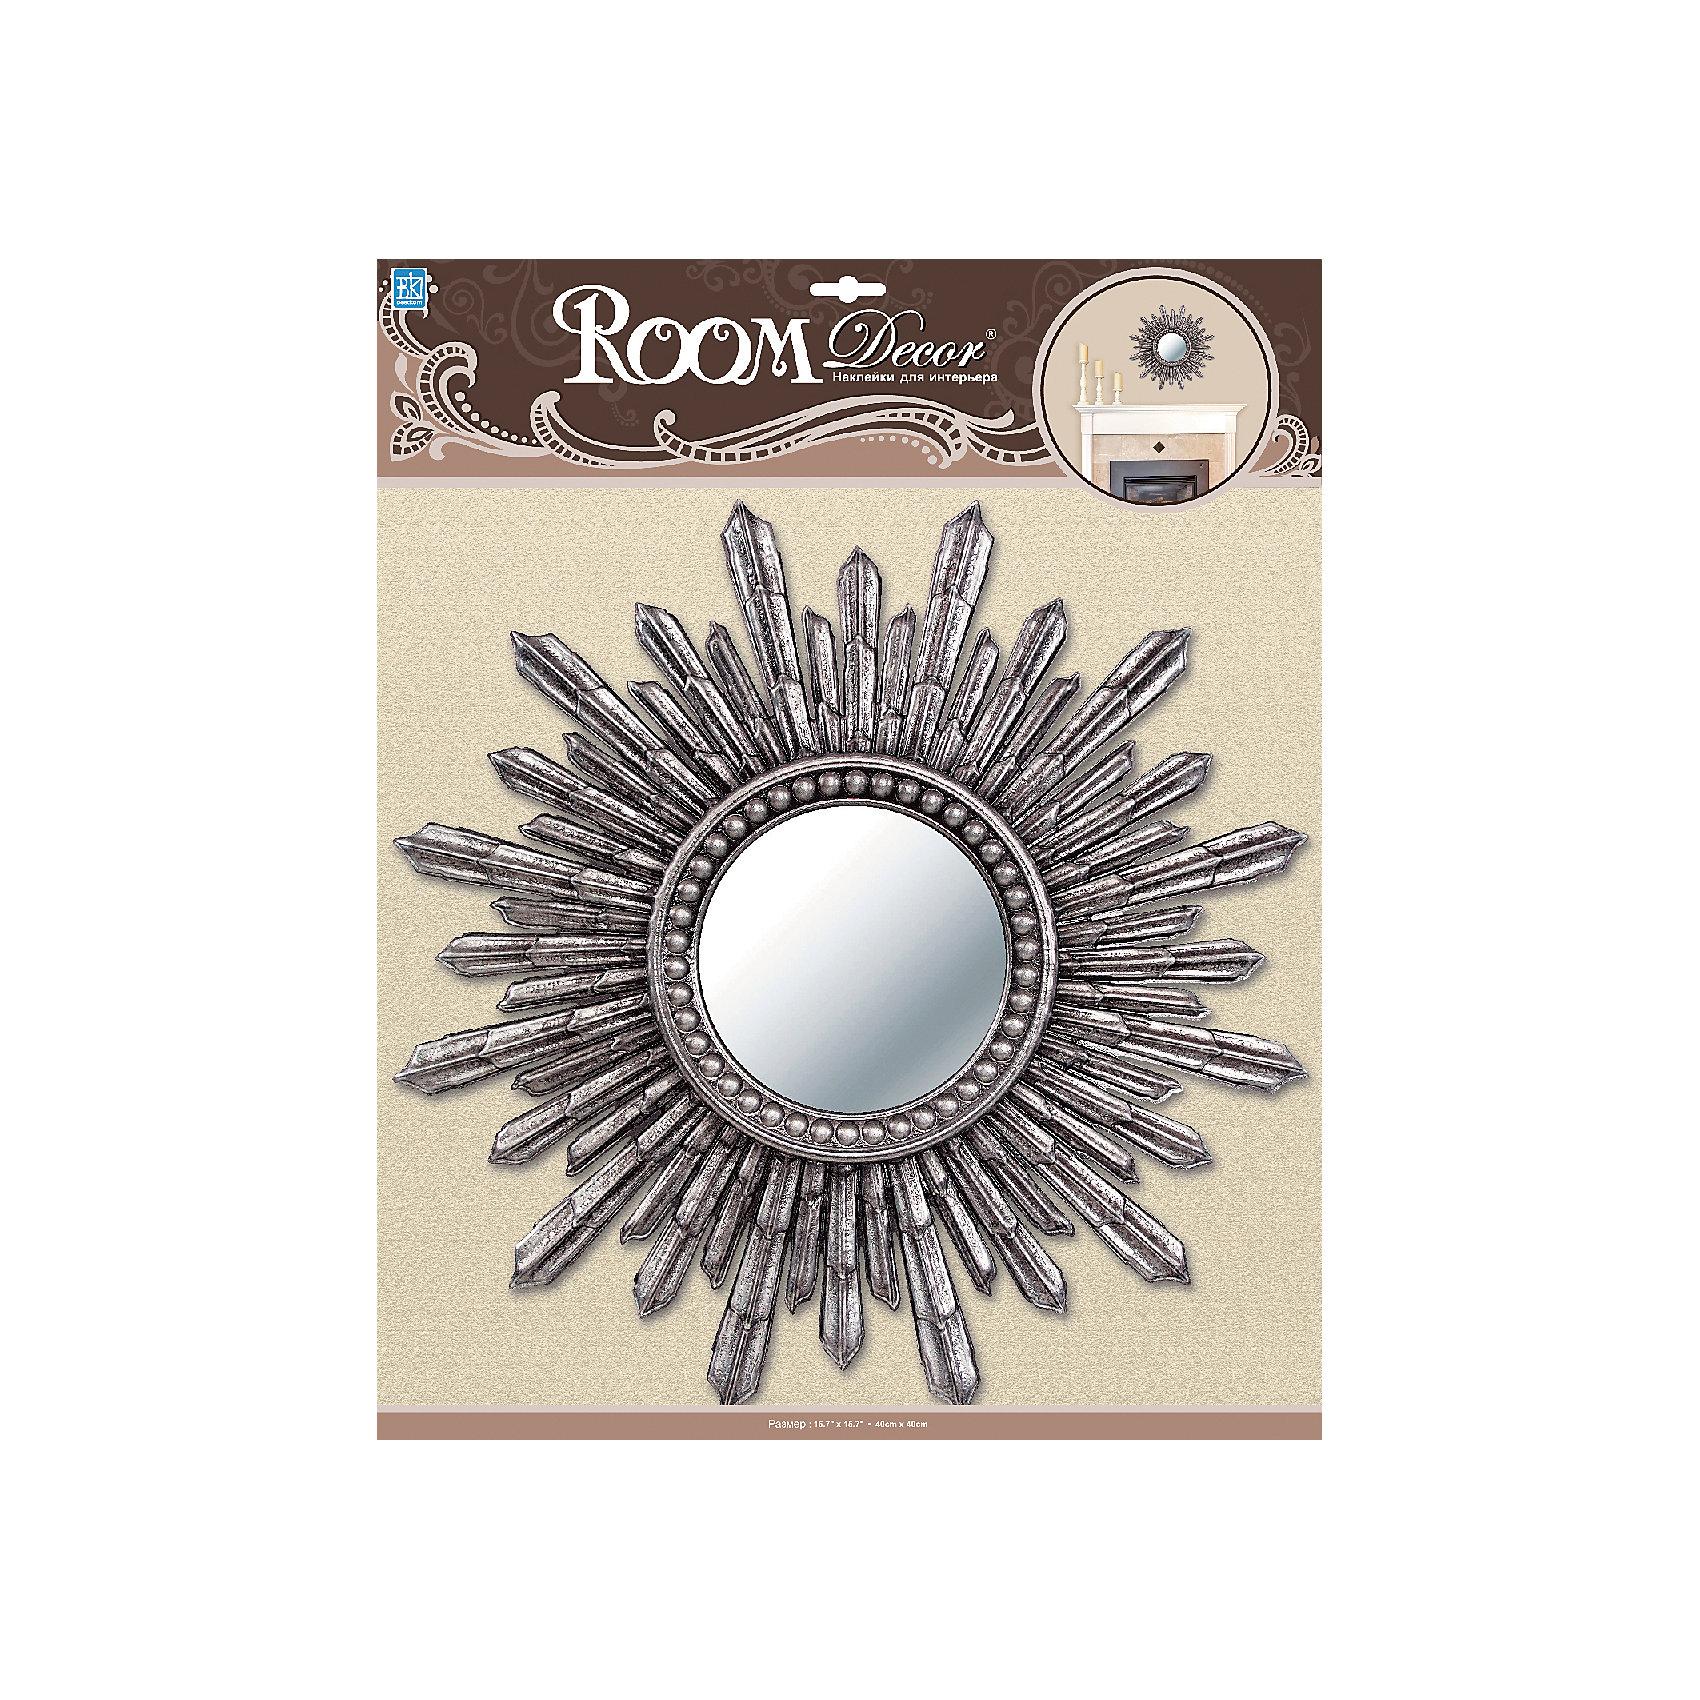 Декоративное зеркало большое № 4, Room Decor, серебро от myToys